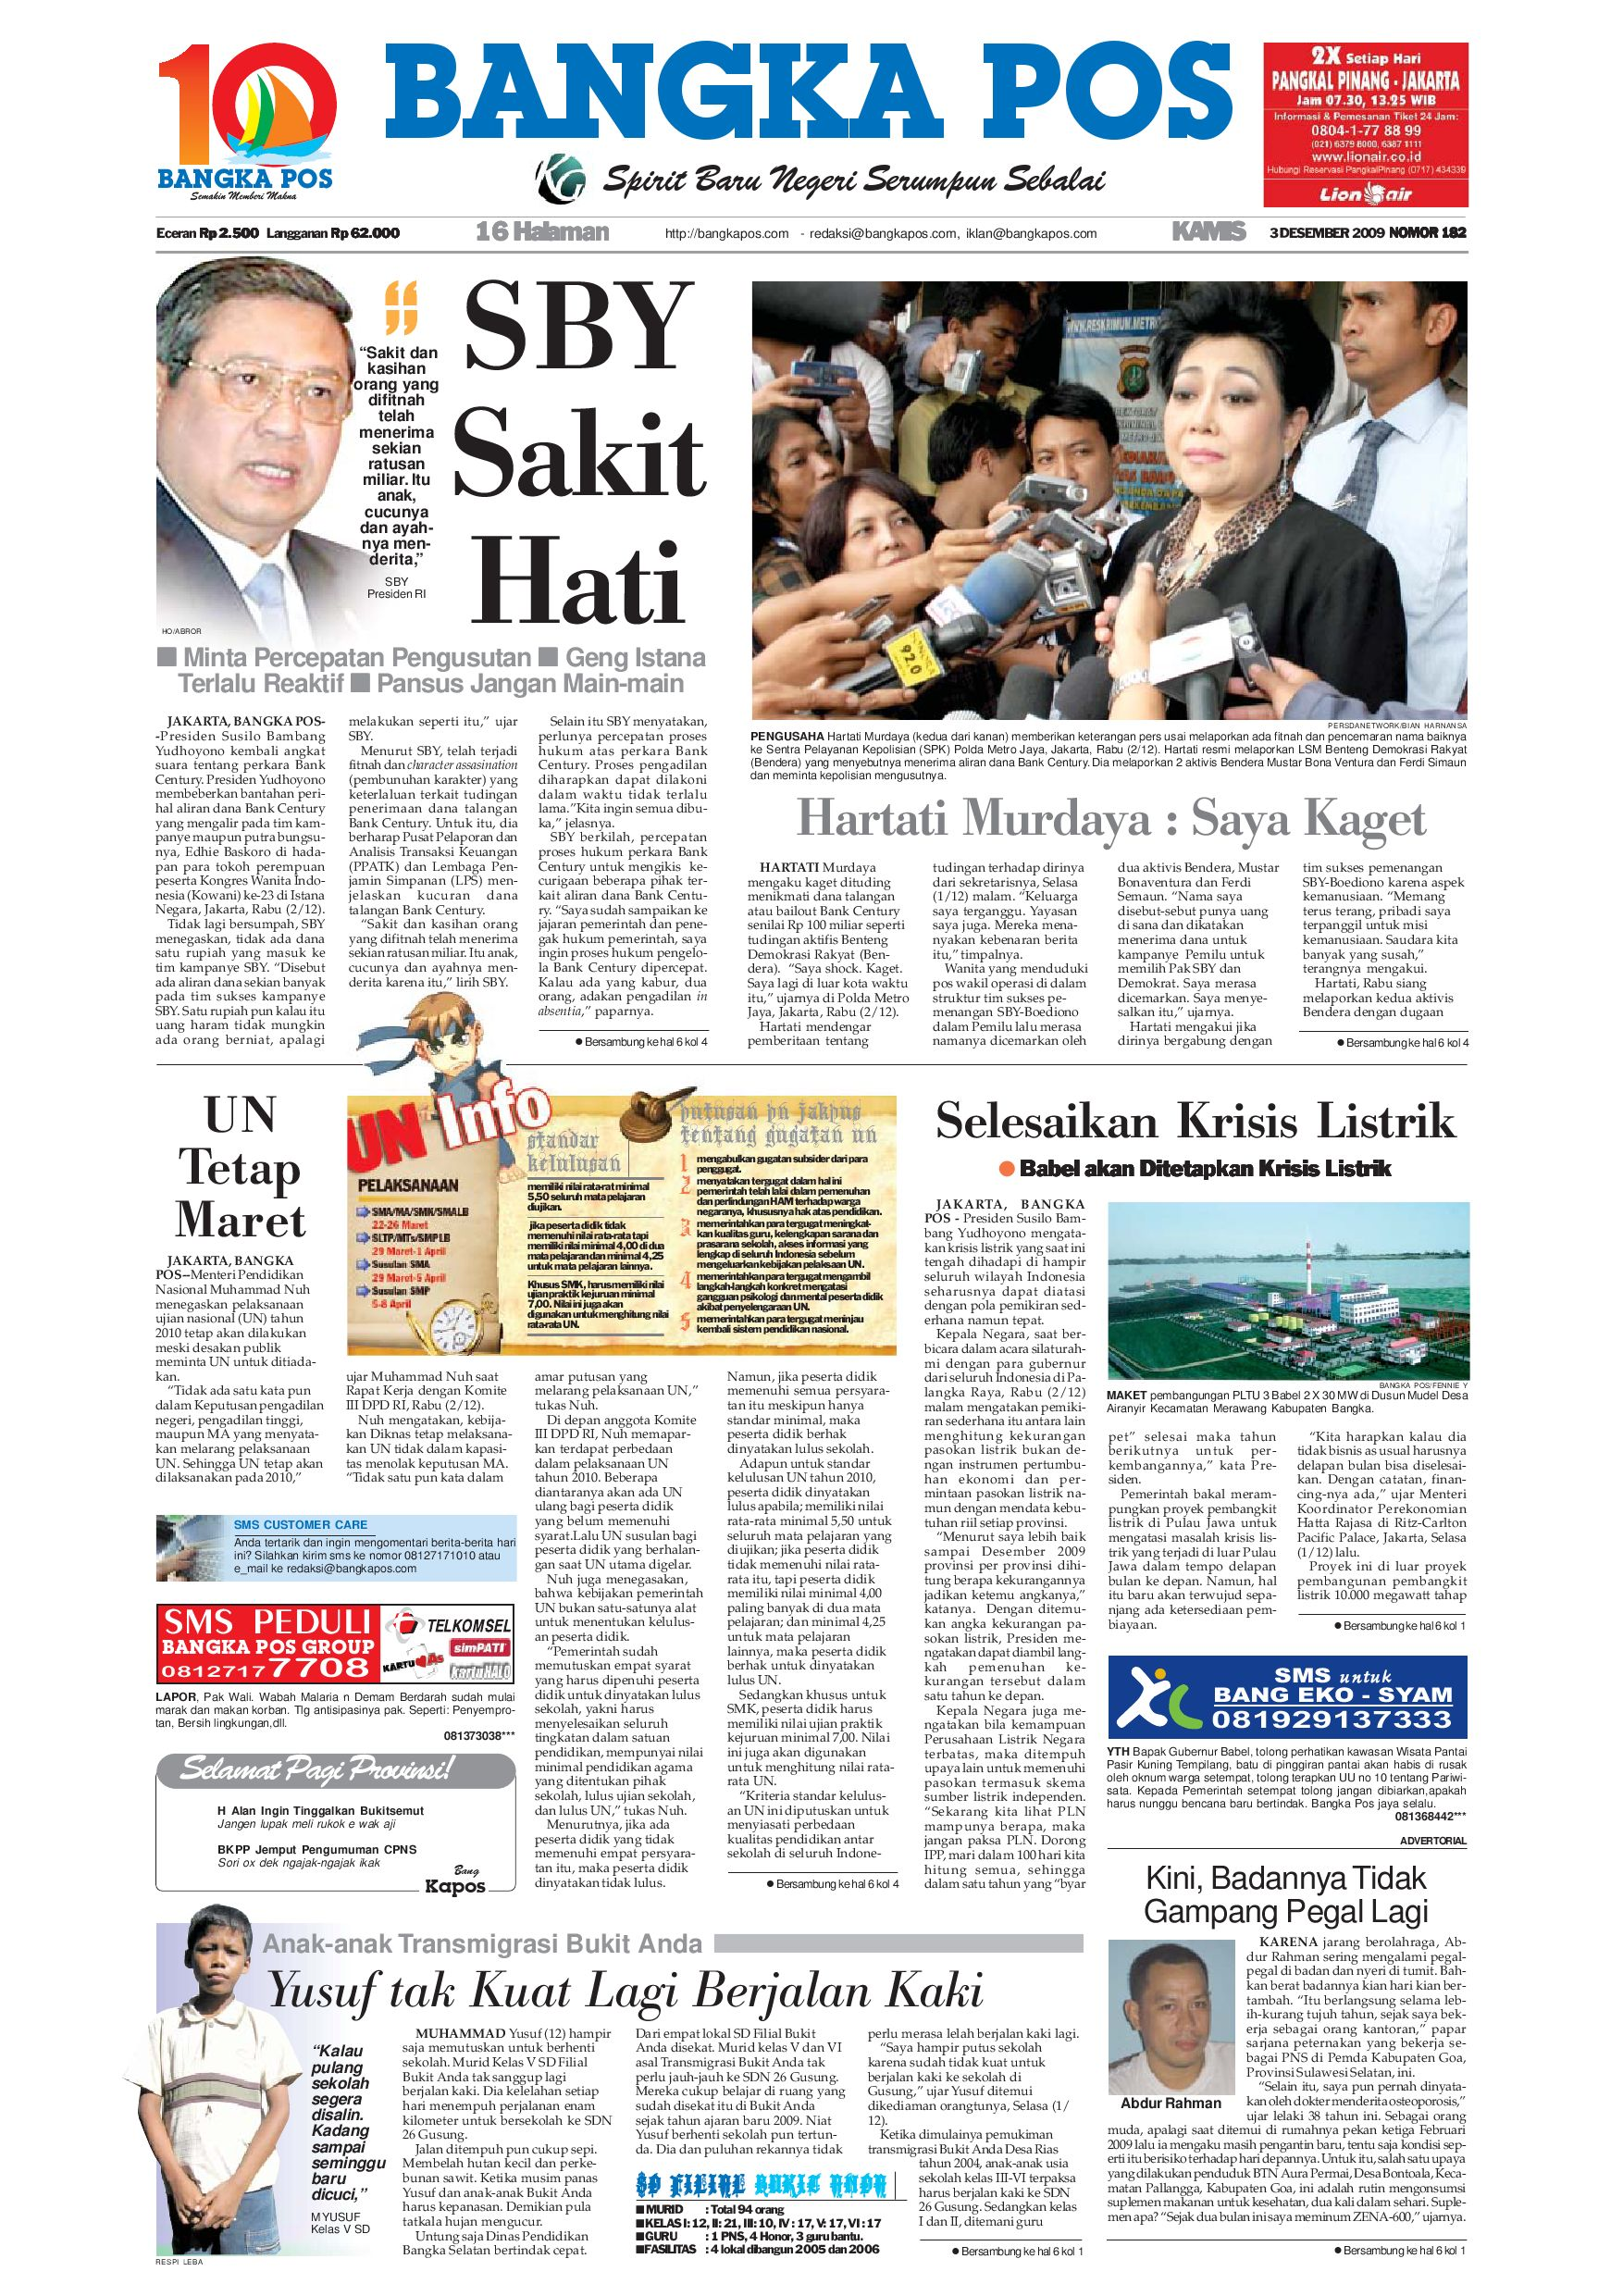 Harian Pagi Bangka Pos Edisi 03 Desember 2009 By Issuu Jam Tangan Qampampq A170 Original Bergaransi